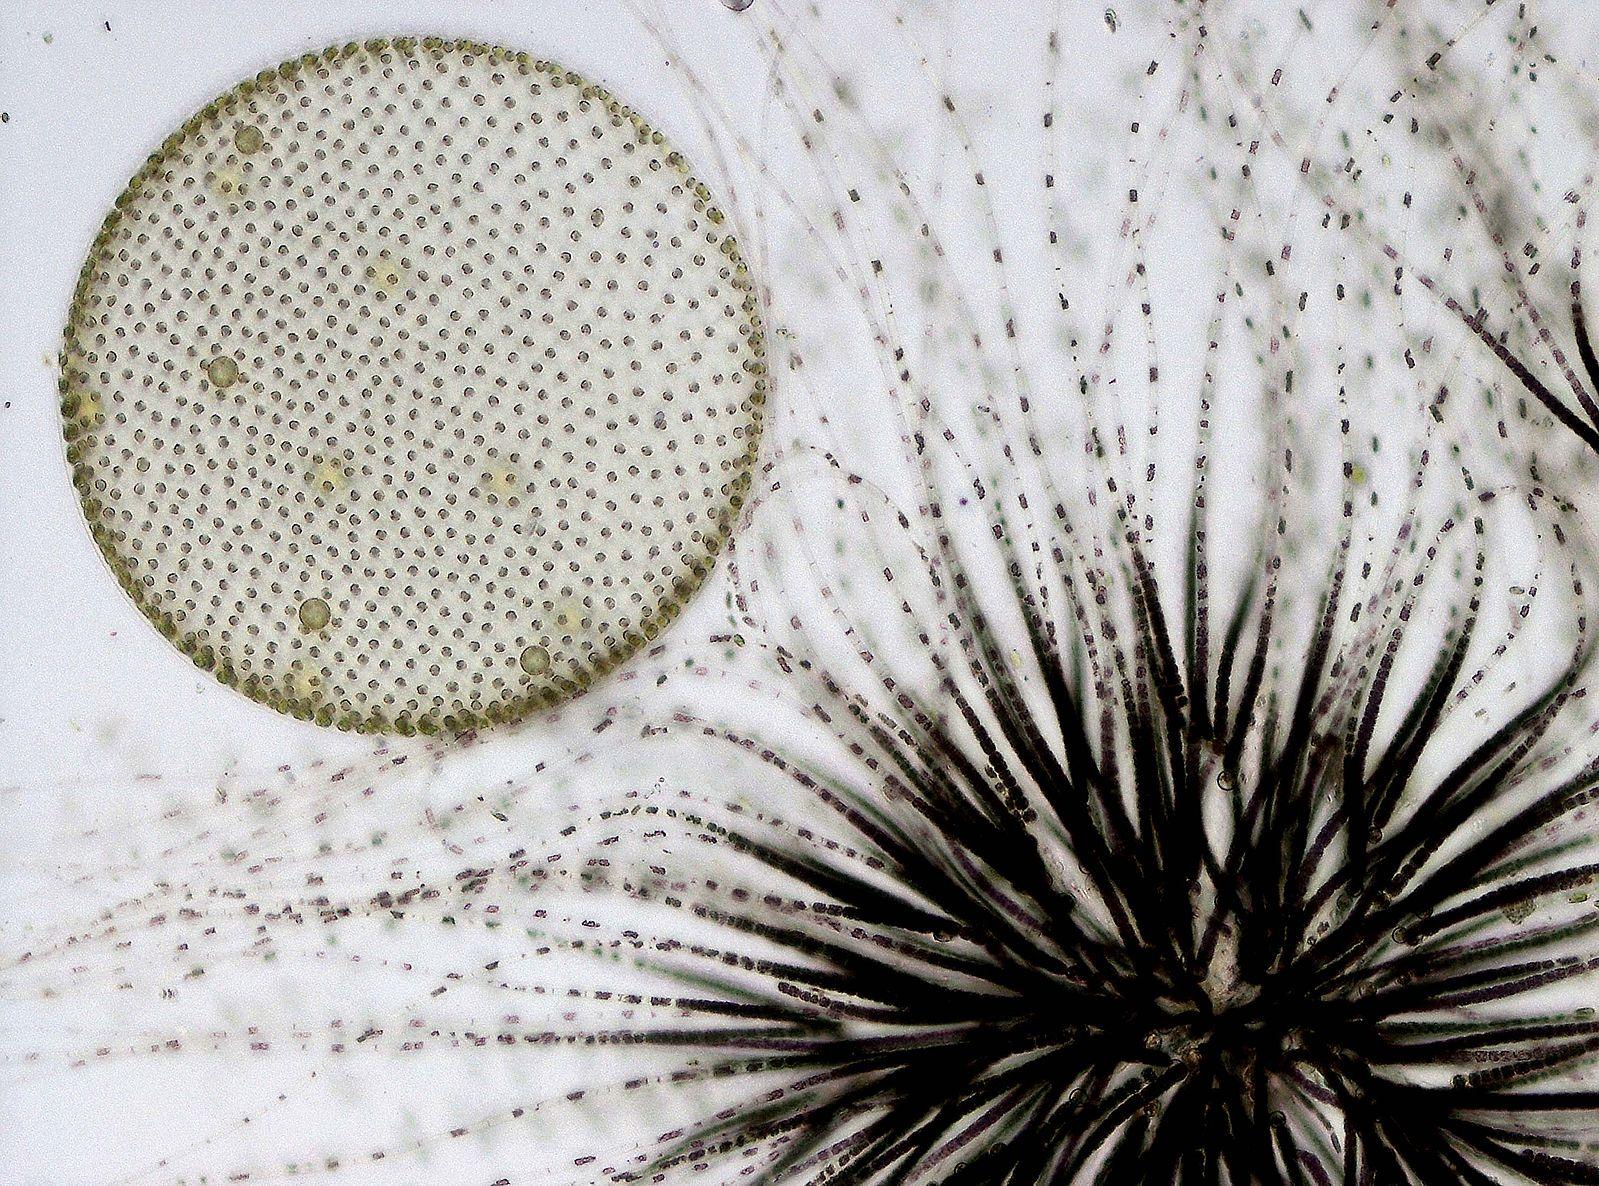 Volvox and Gloeotrichia colonies